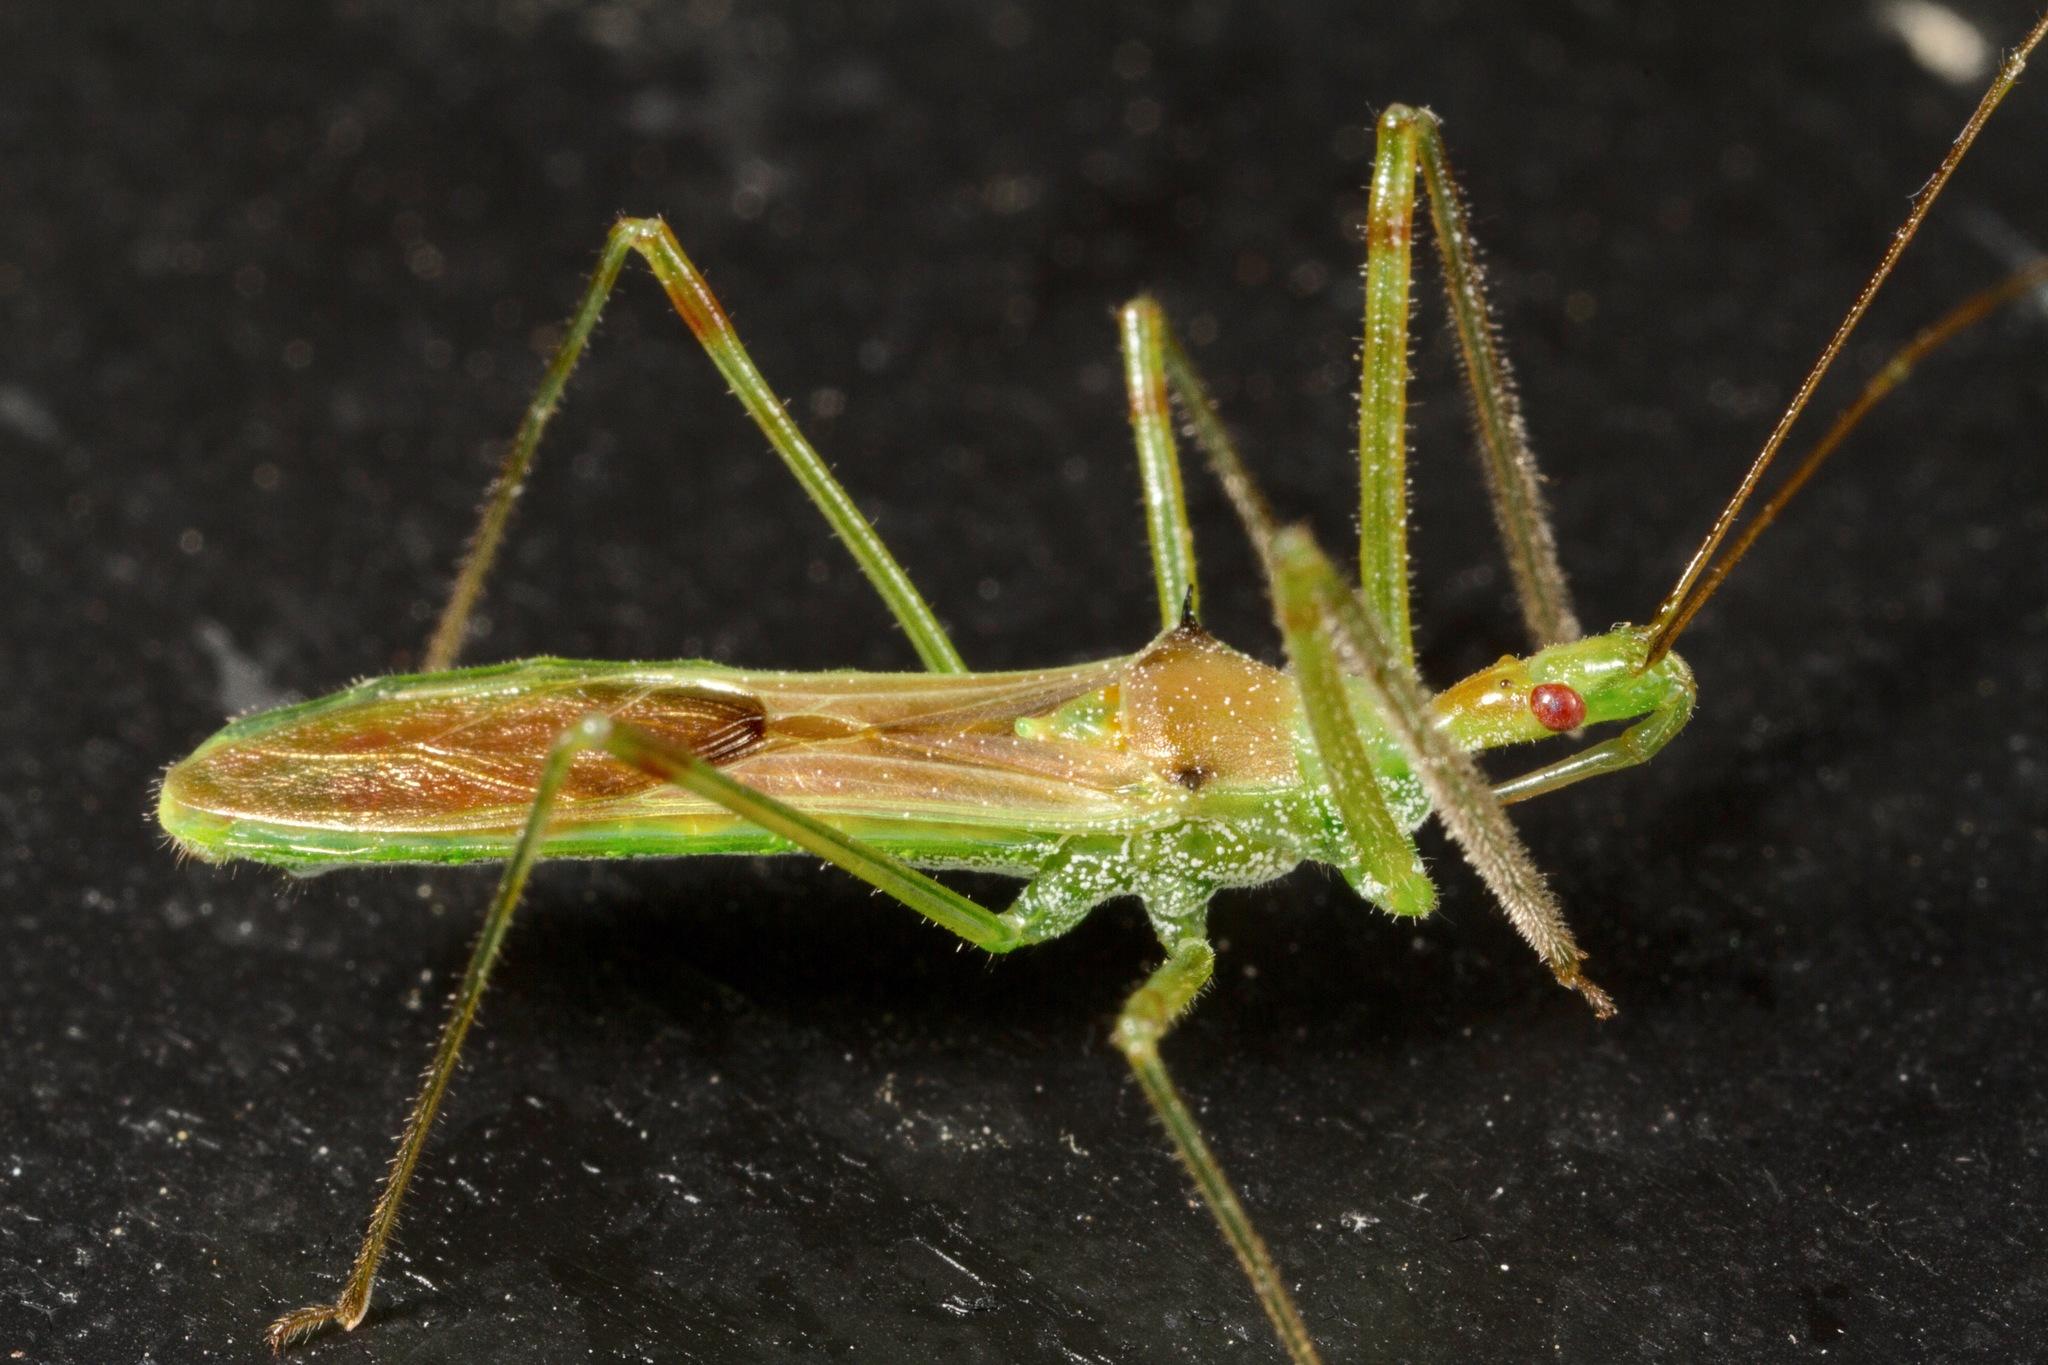 Pale Green Assassin Bug (Zelus luridus) · iNaturalist org